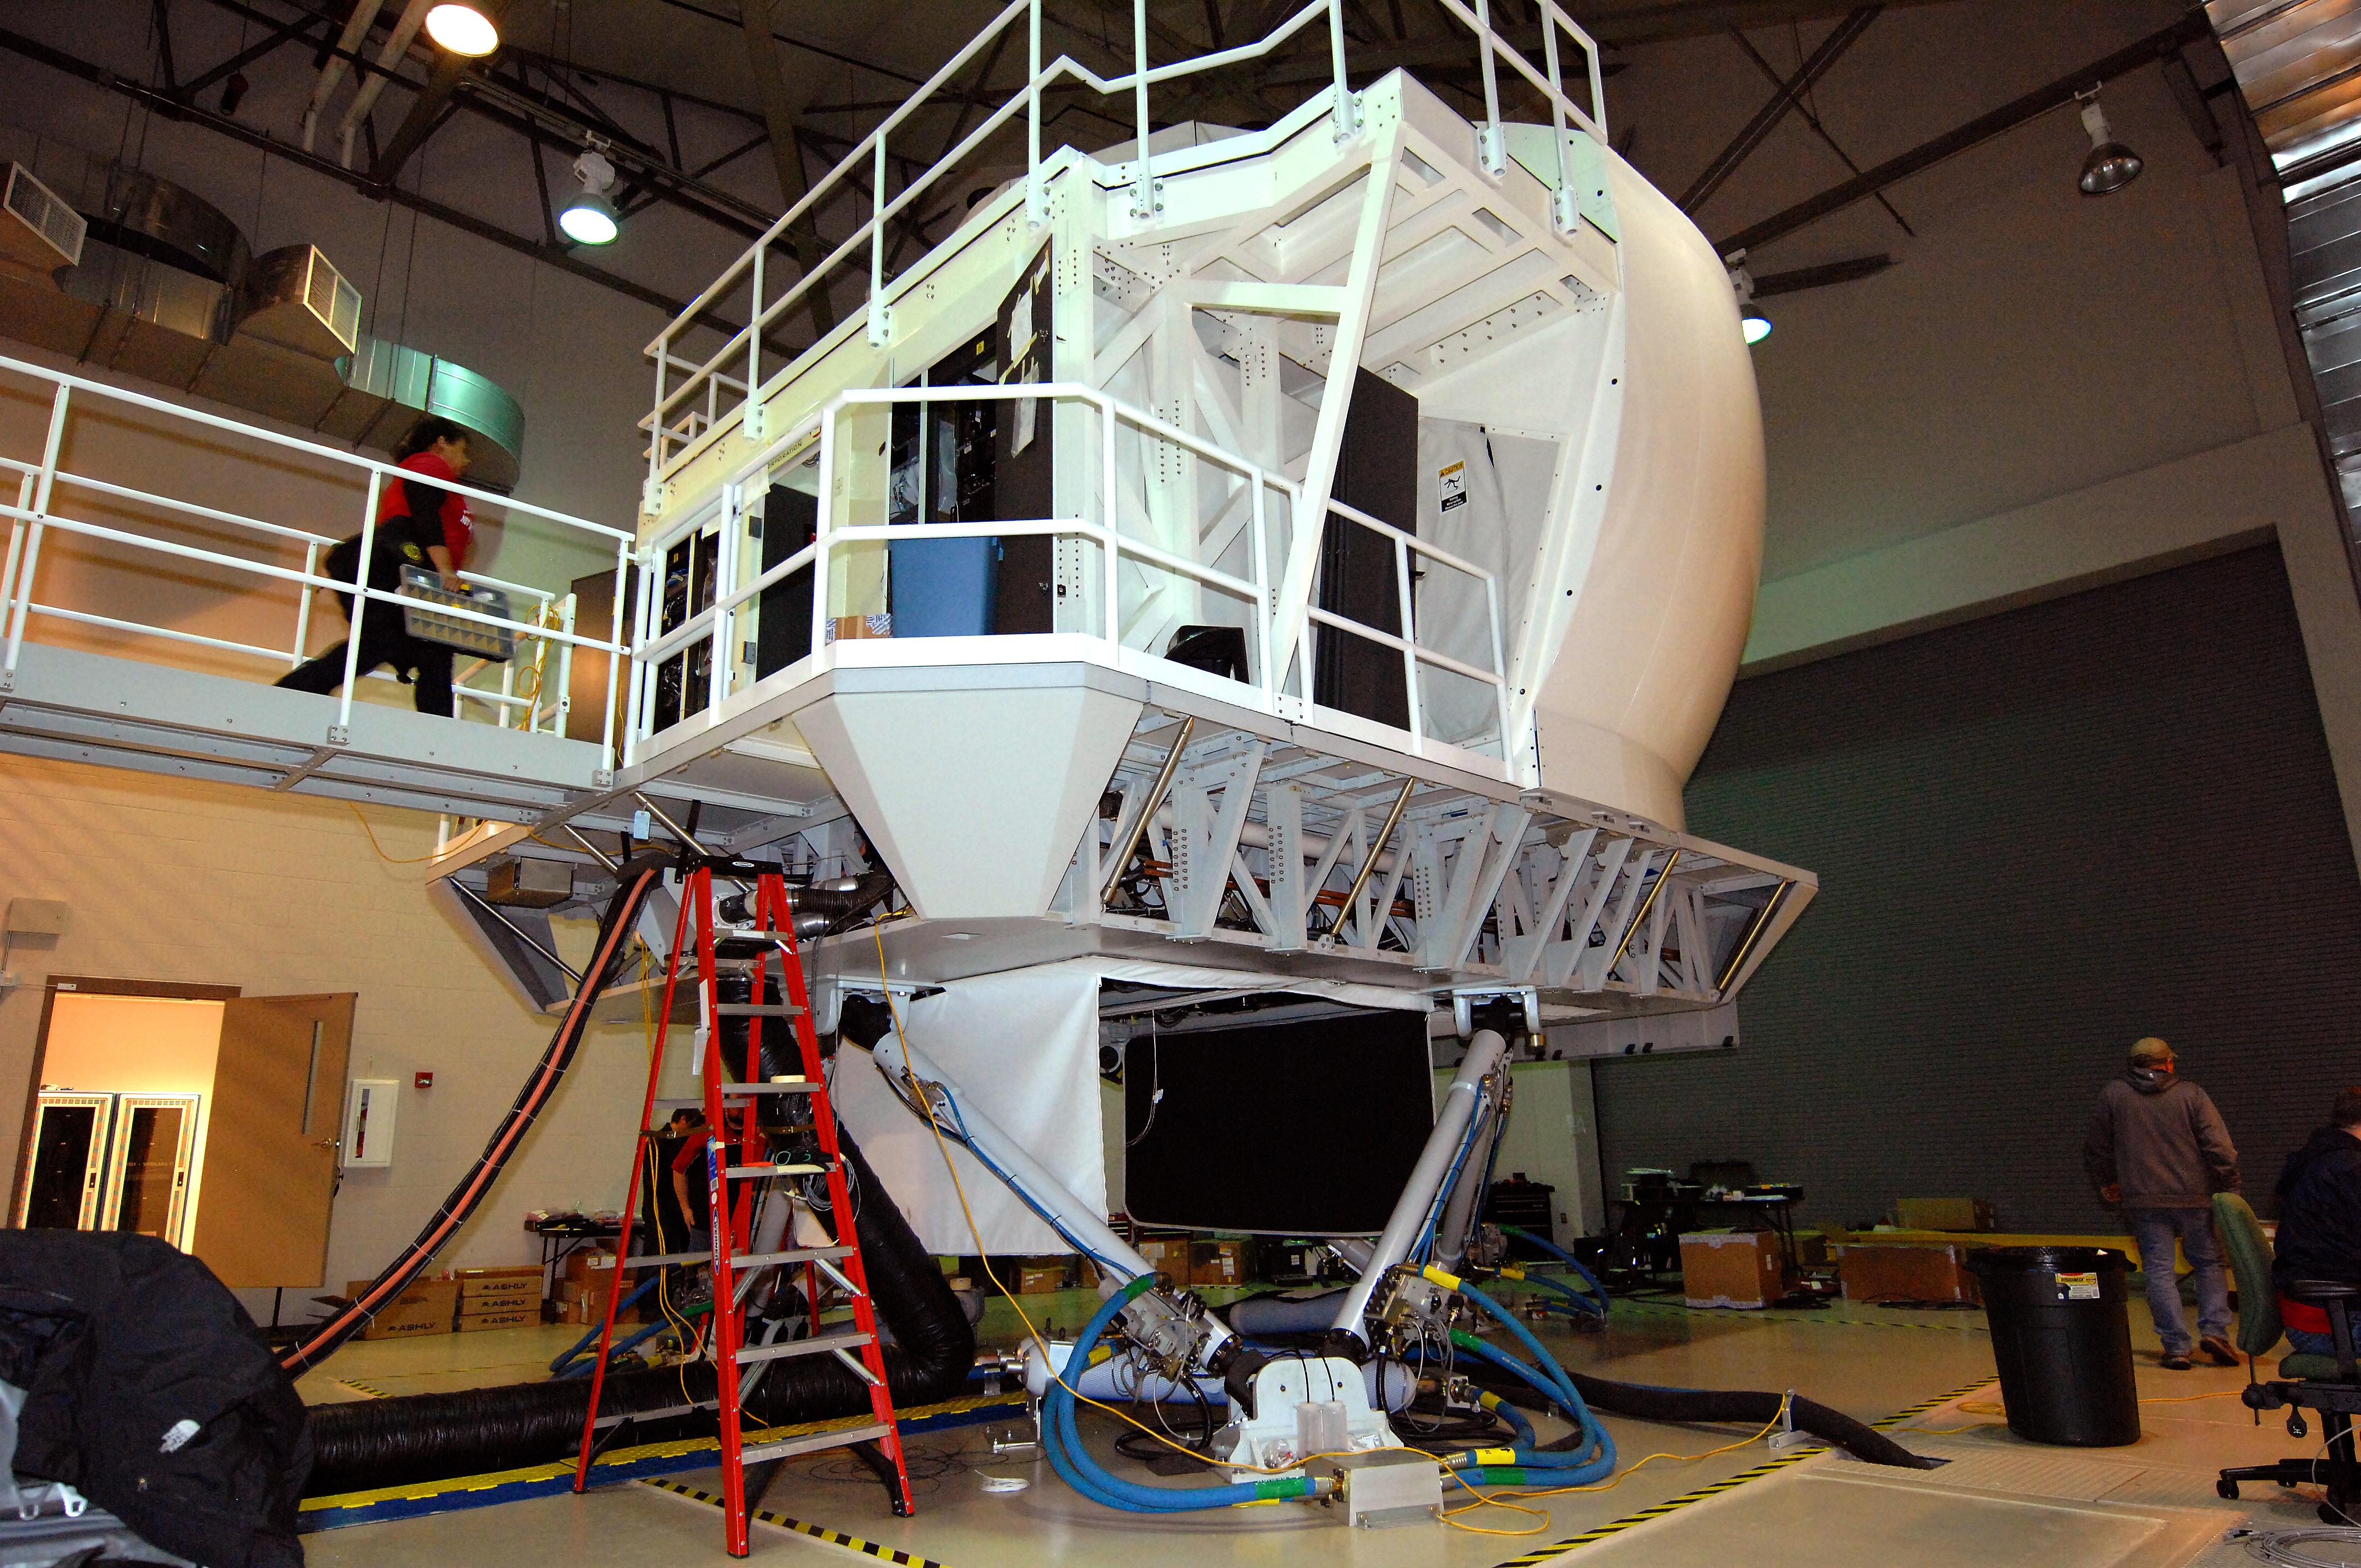 File:L3 Technologies RC-135 full flight simulator in Offutt